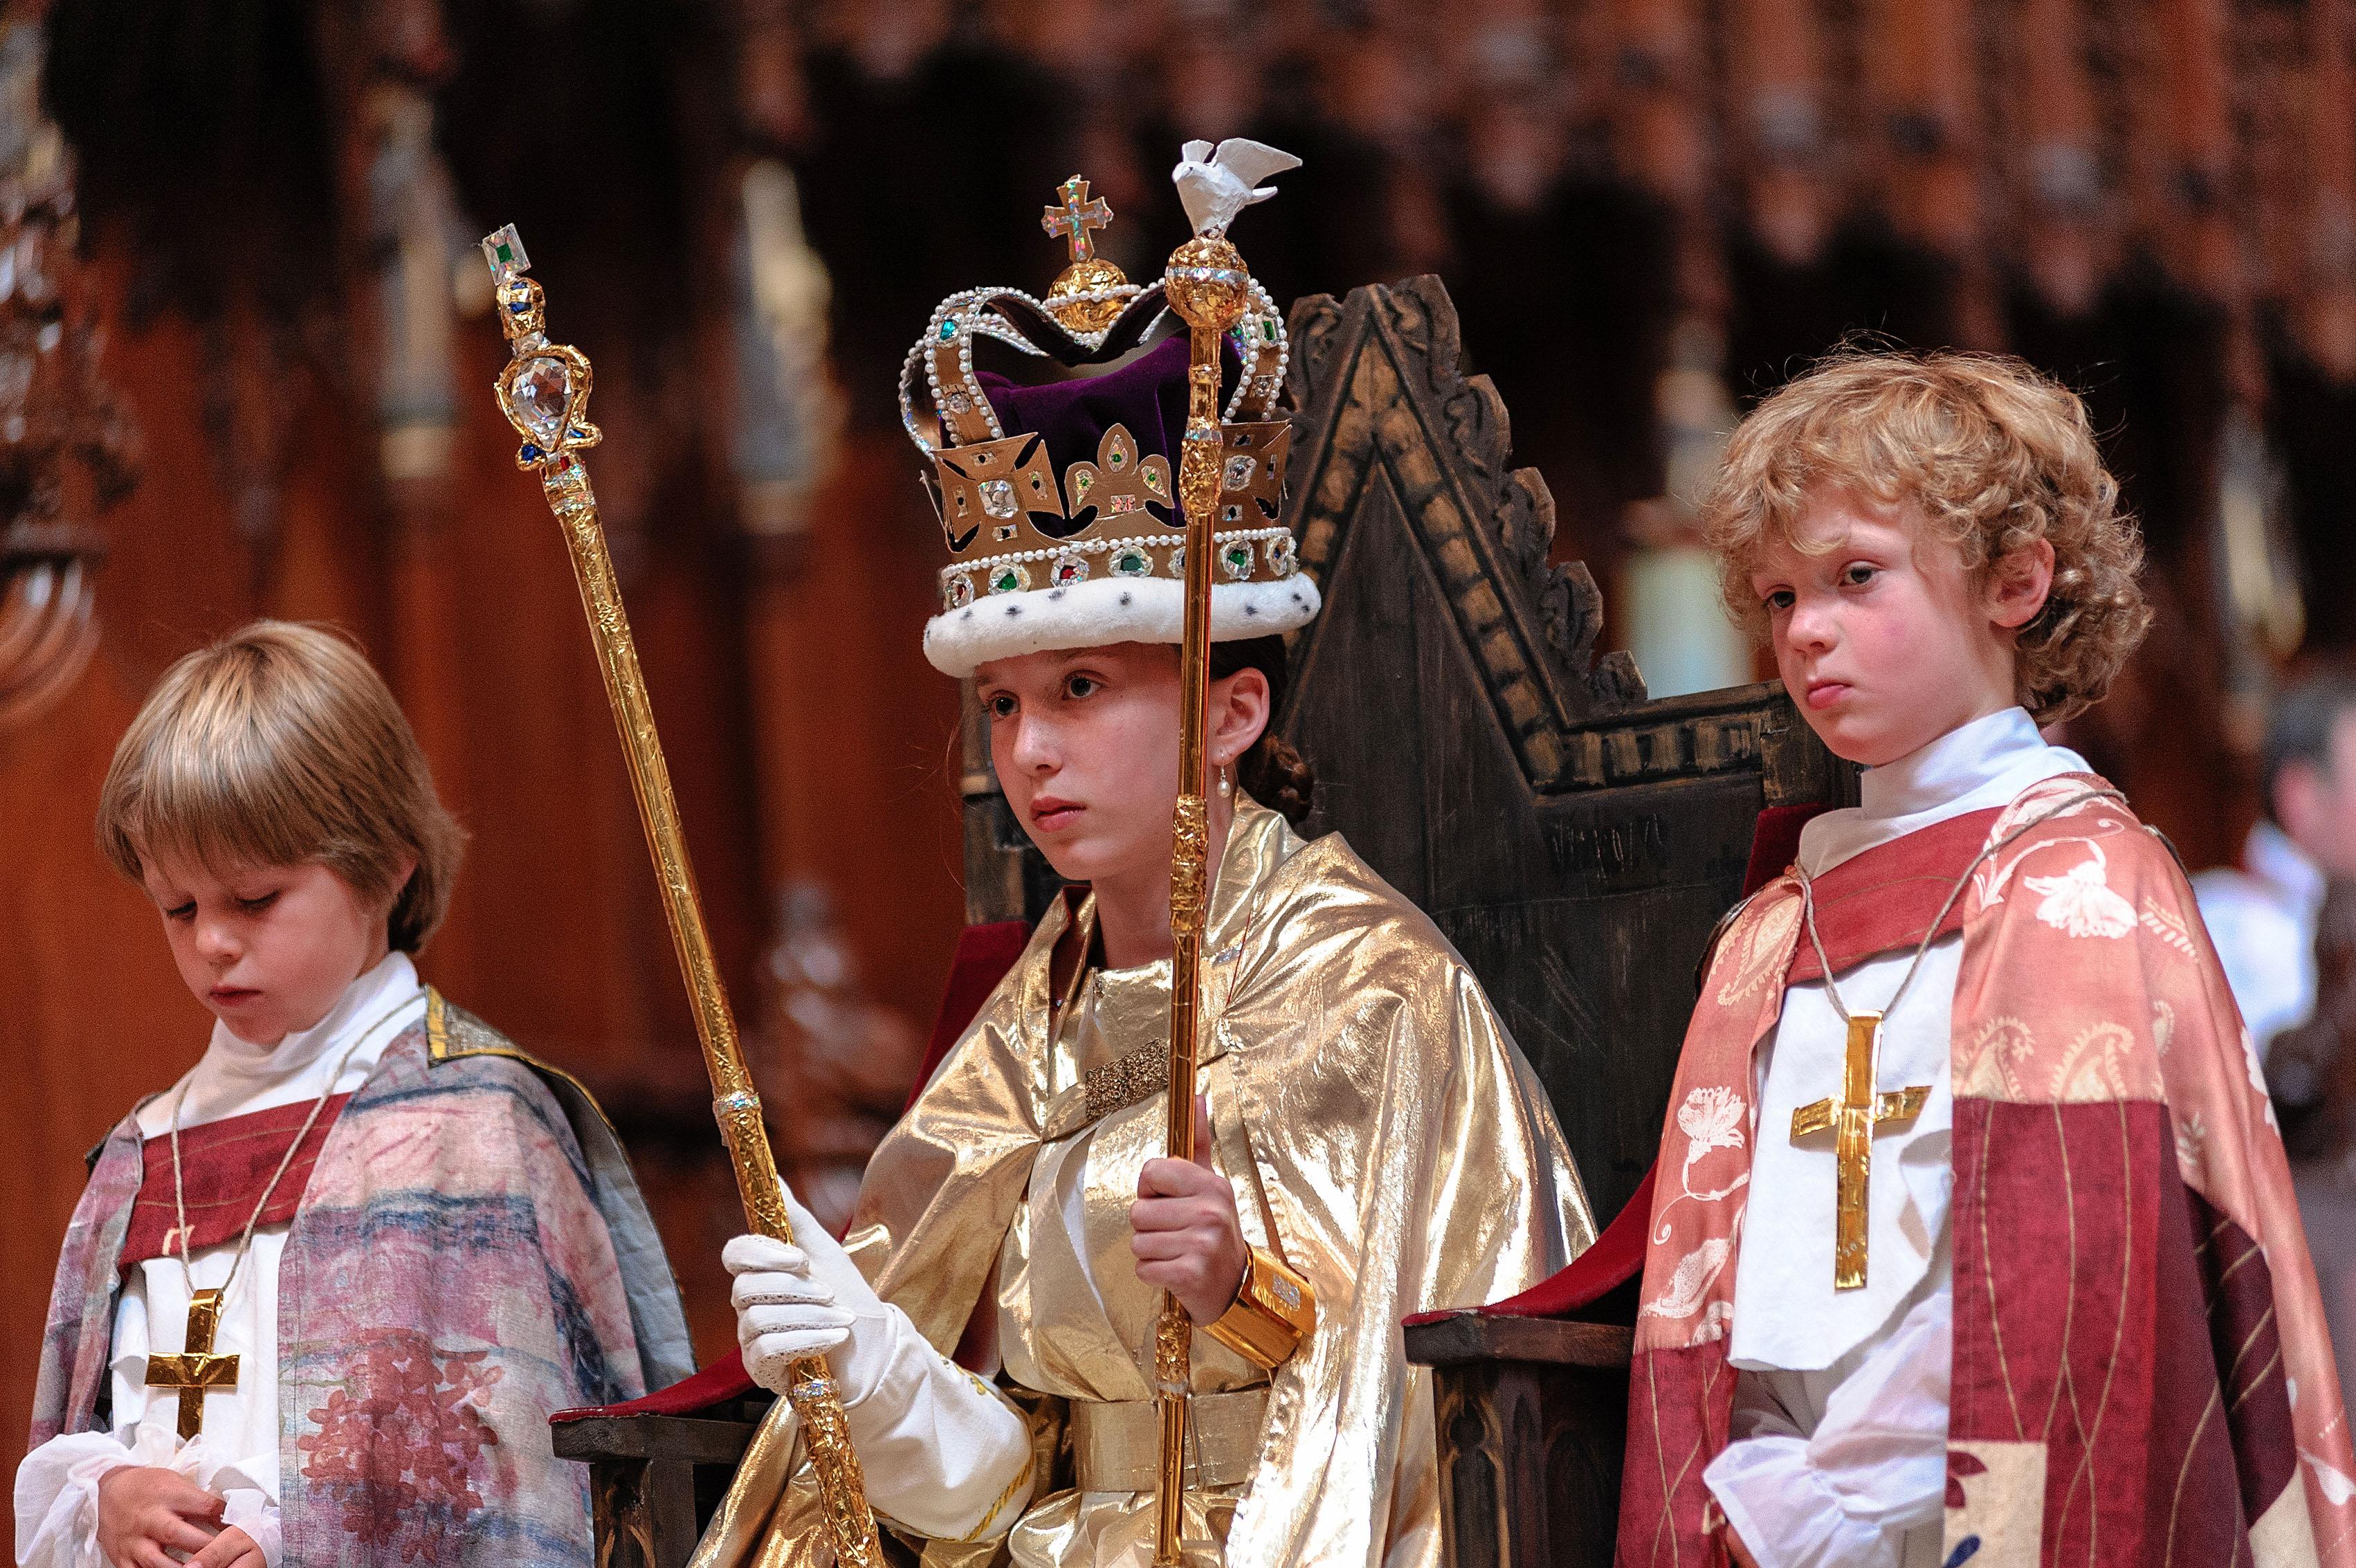 0613-0122 PR4Photos - Cathedral - Coronation